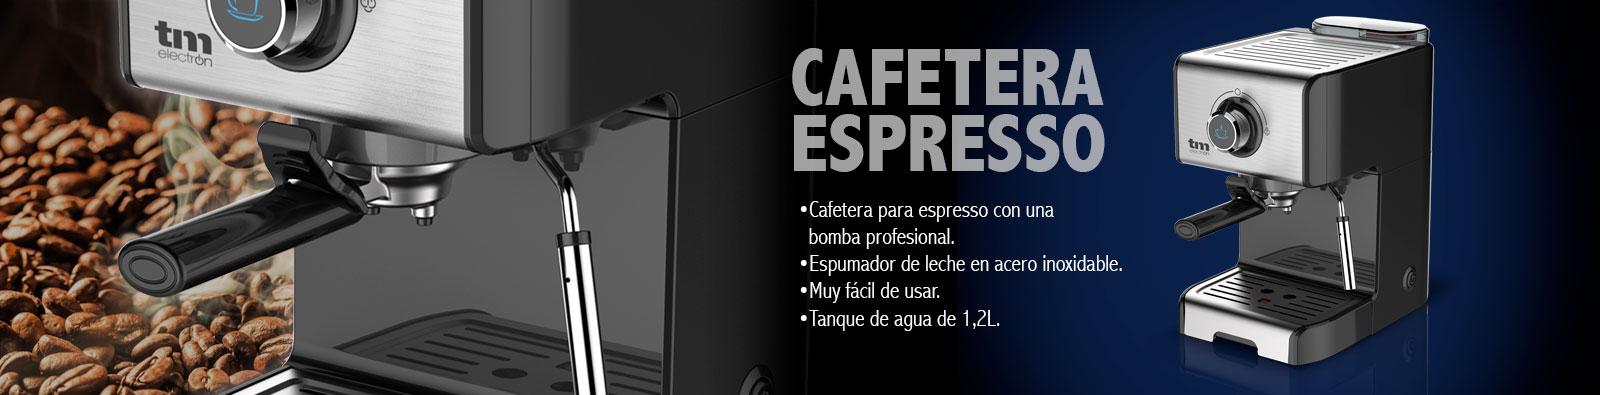 cabecera-cafetera_2